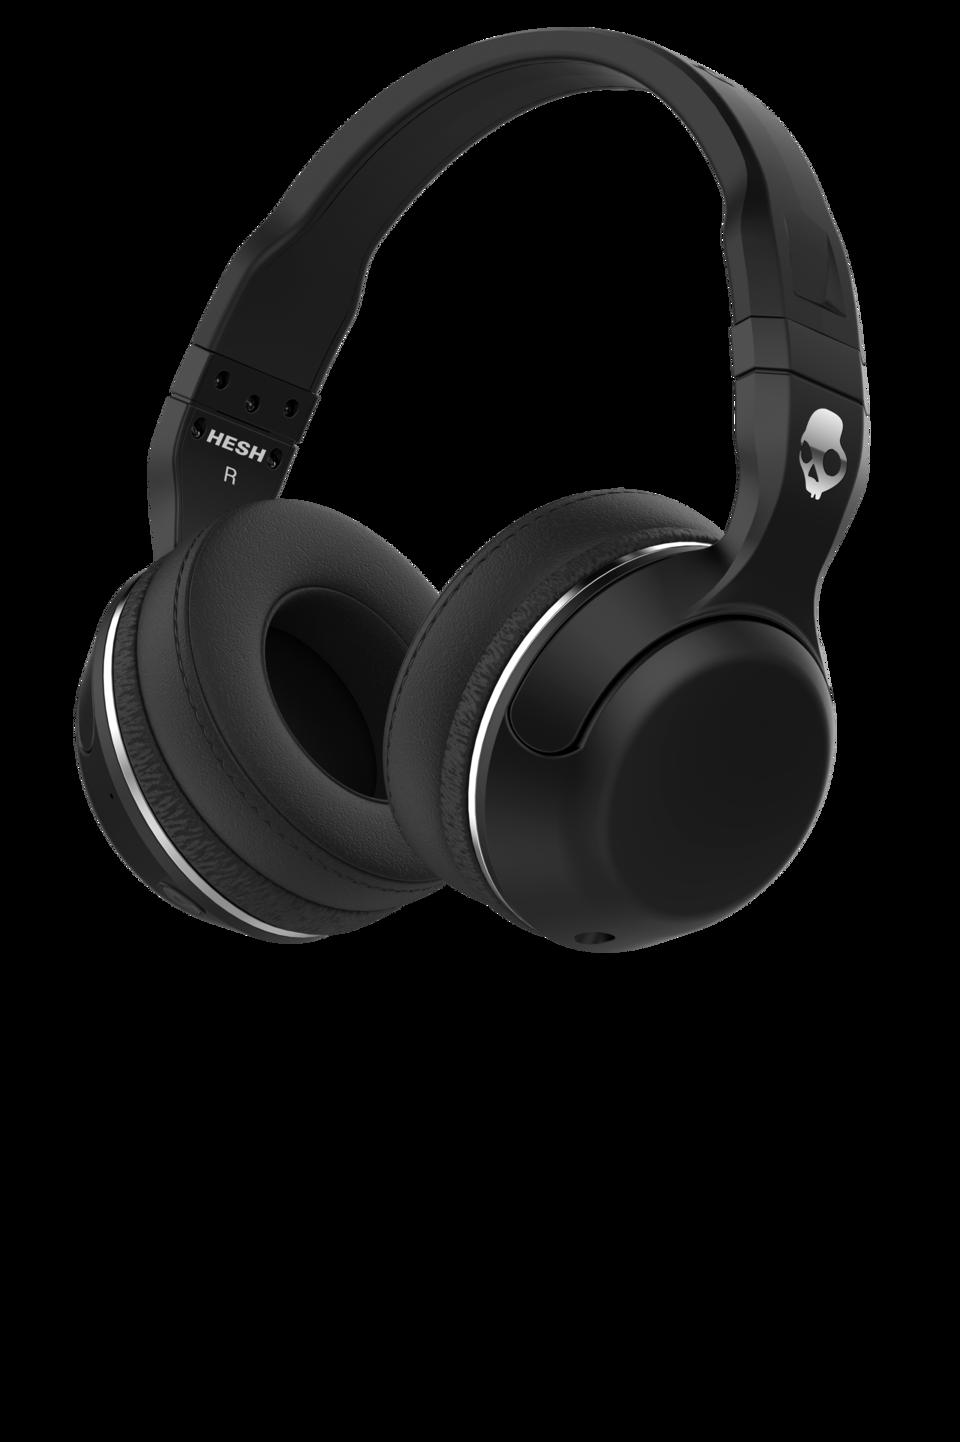 buy skullcandy hesh 2 wireless bluetooth headphone at walmart com sony afterglow headphone wiring-diagram buy skullcandy hesh 2 wireless bluetooth headphone at walmart com